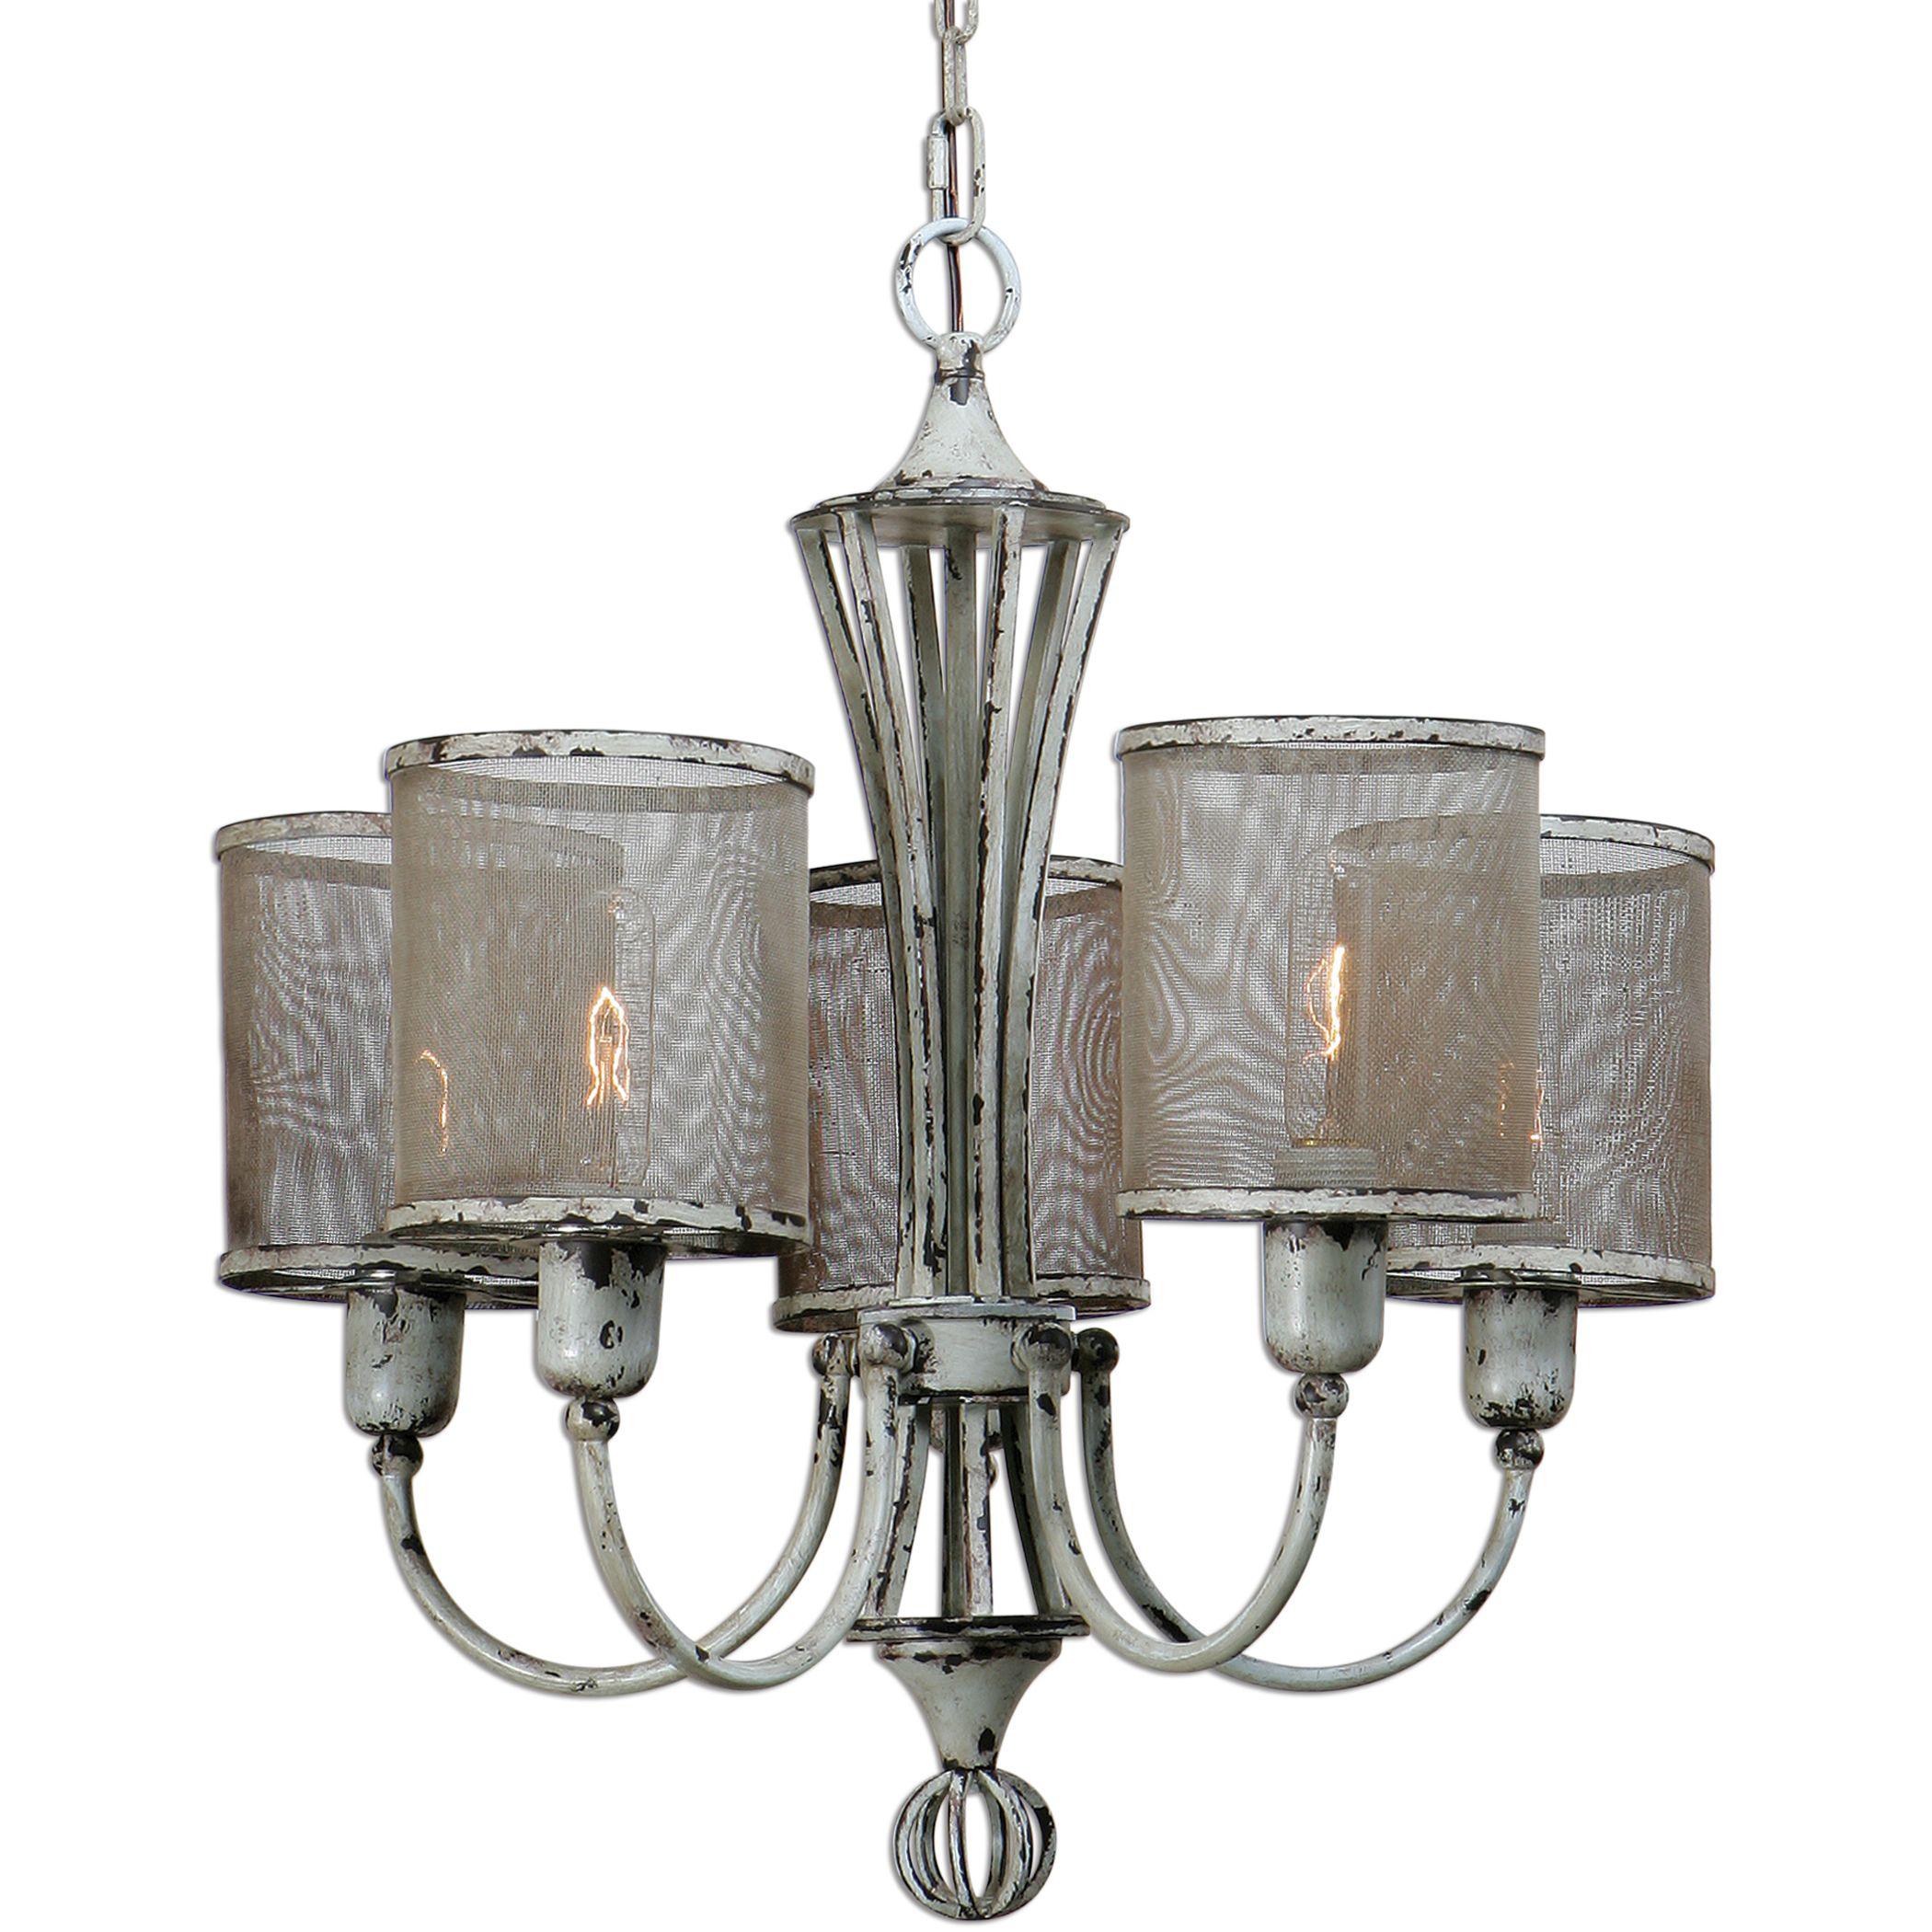 english vintage chandeliers sisters the luxury img theresa luxuryvintagelighting chandelier for lighting maria sale crystal